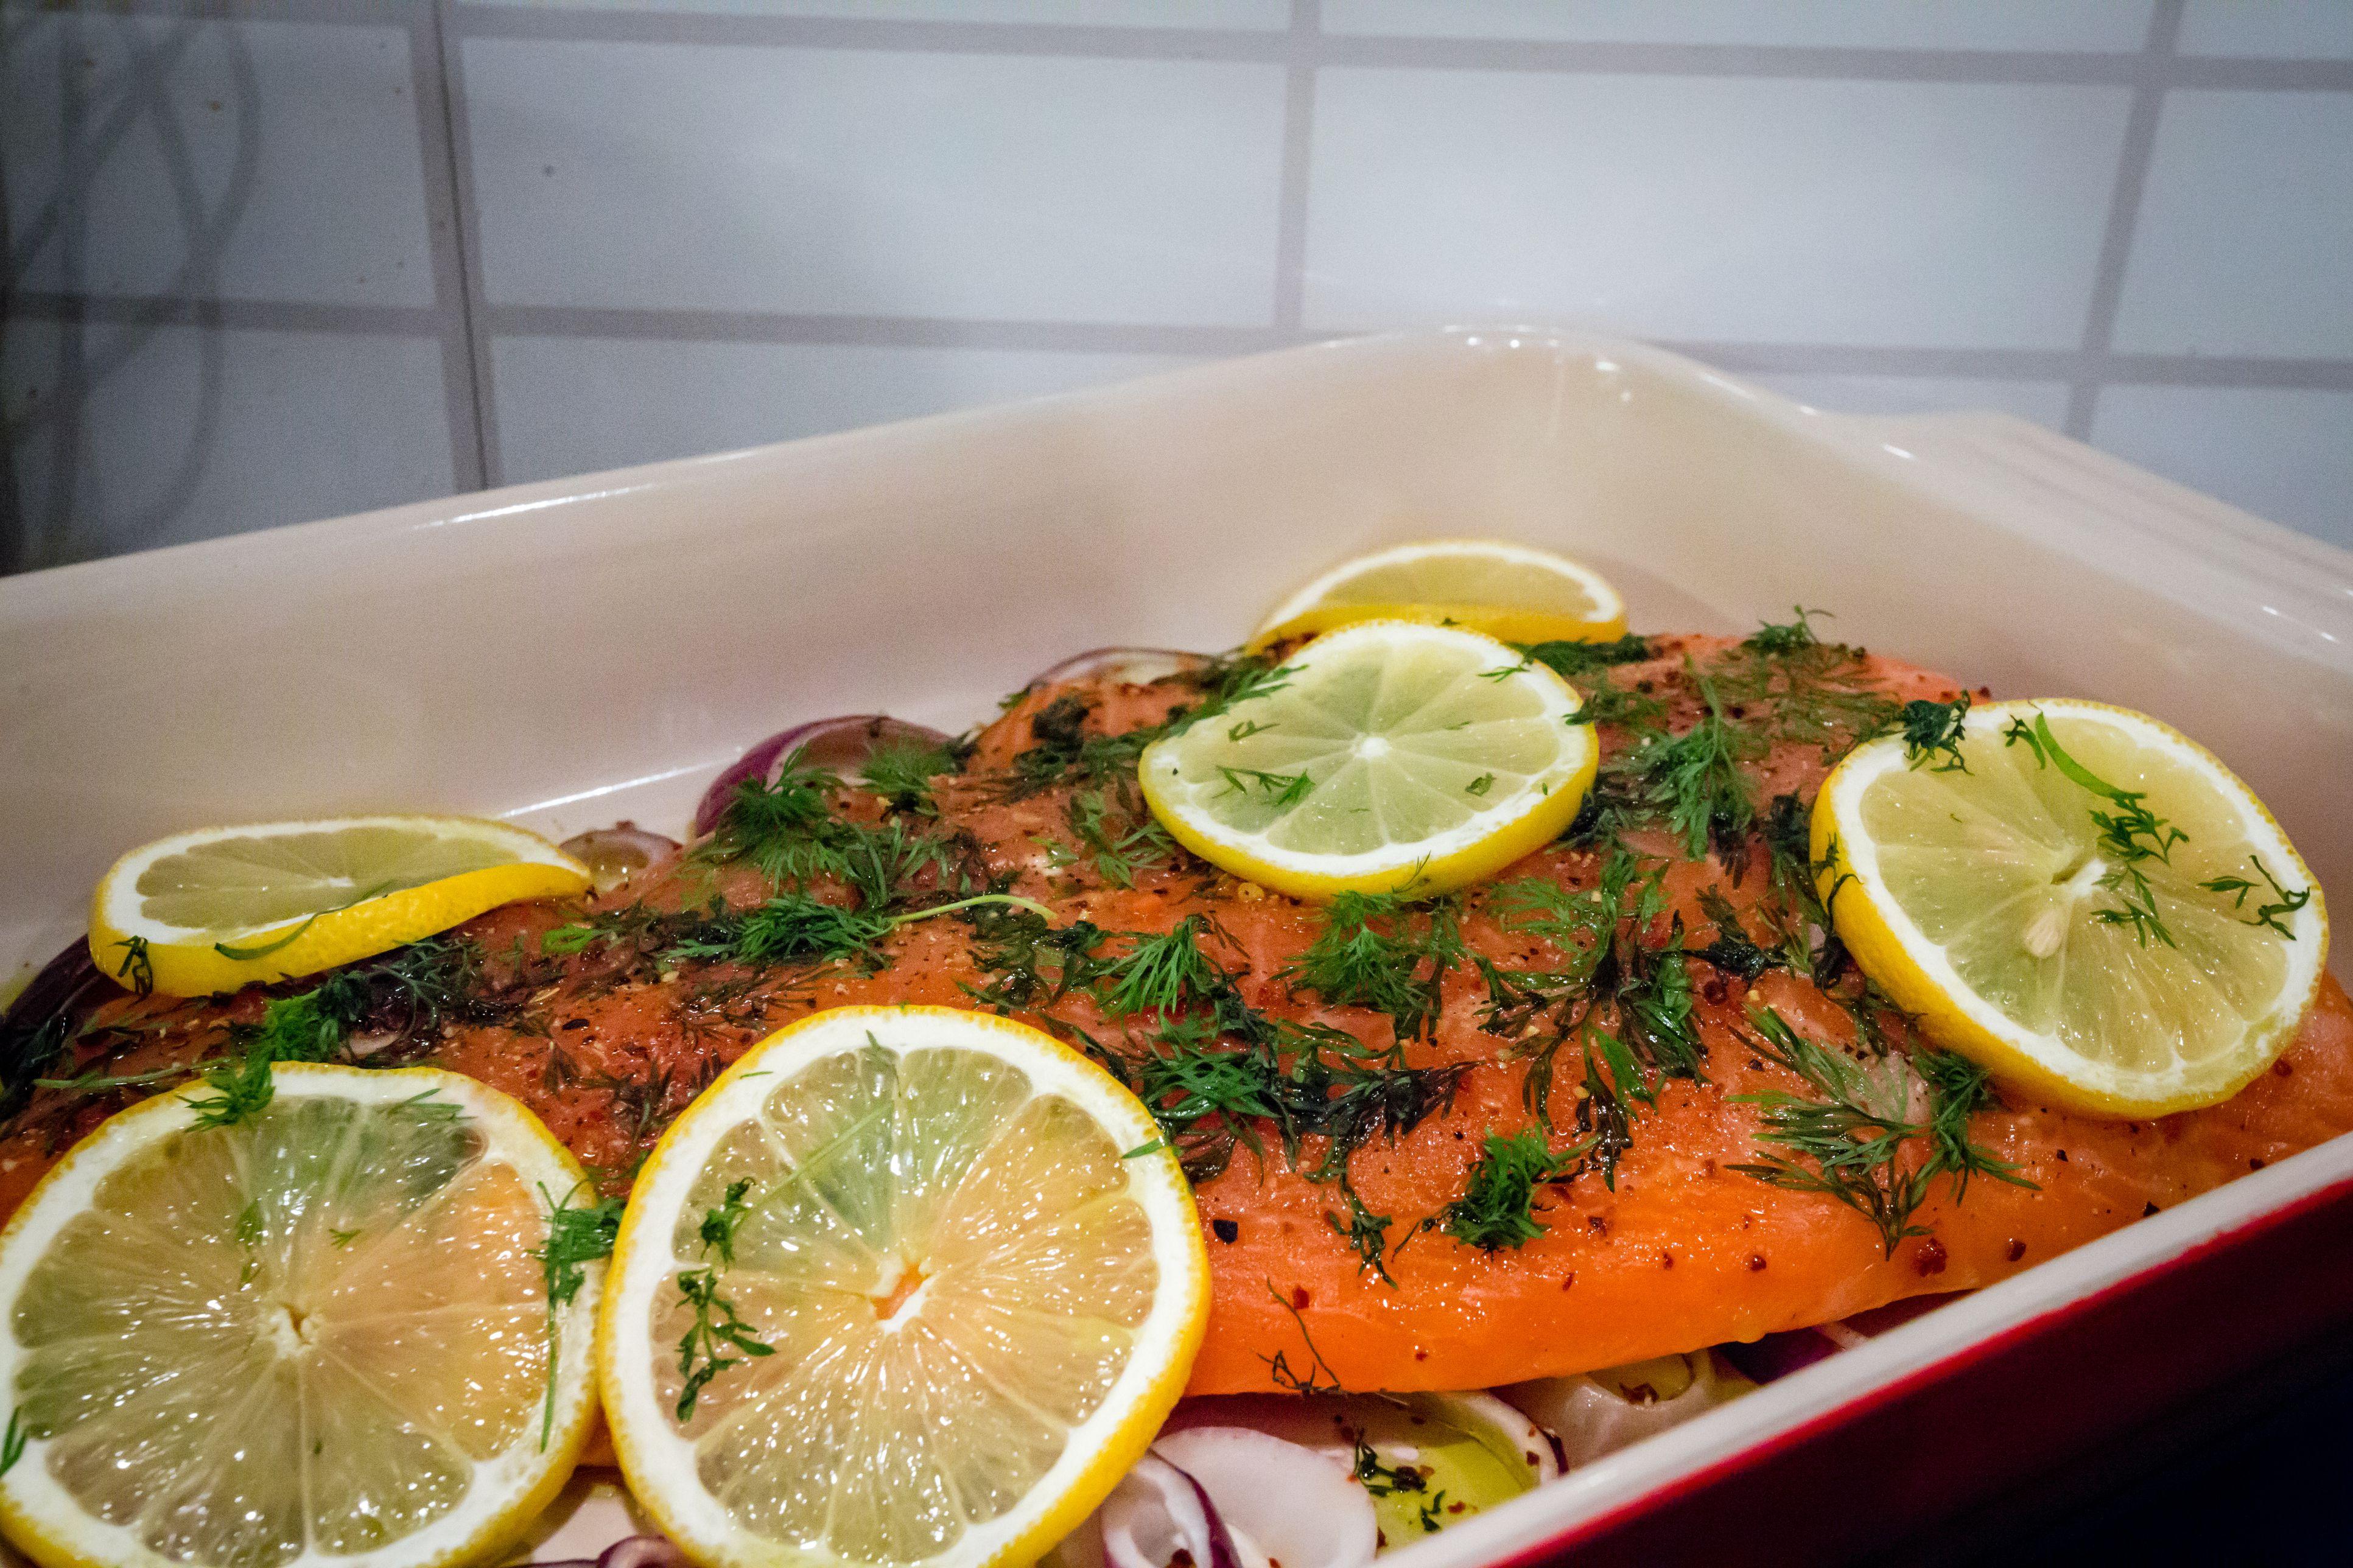 Fillet of Salmon